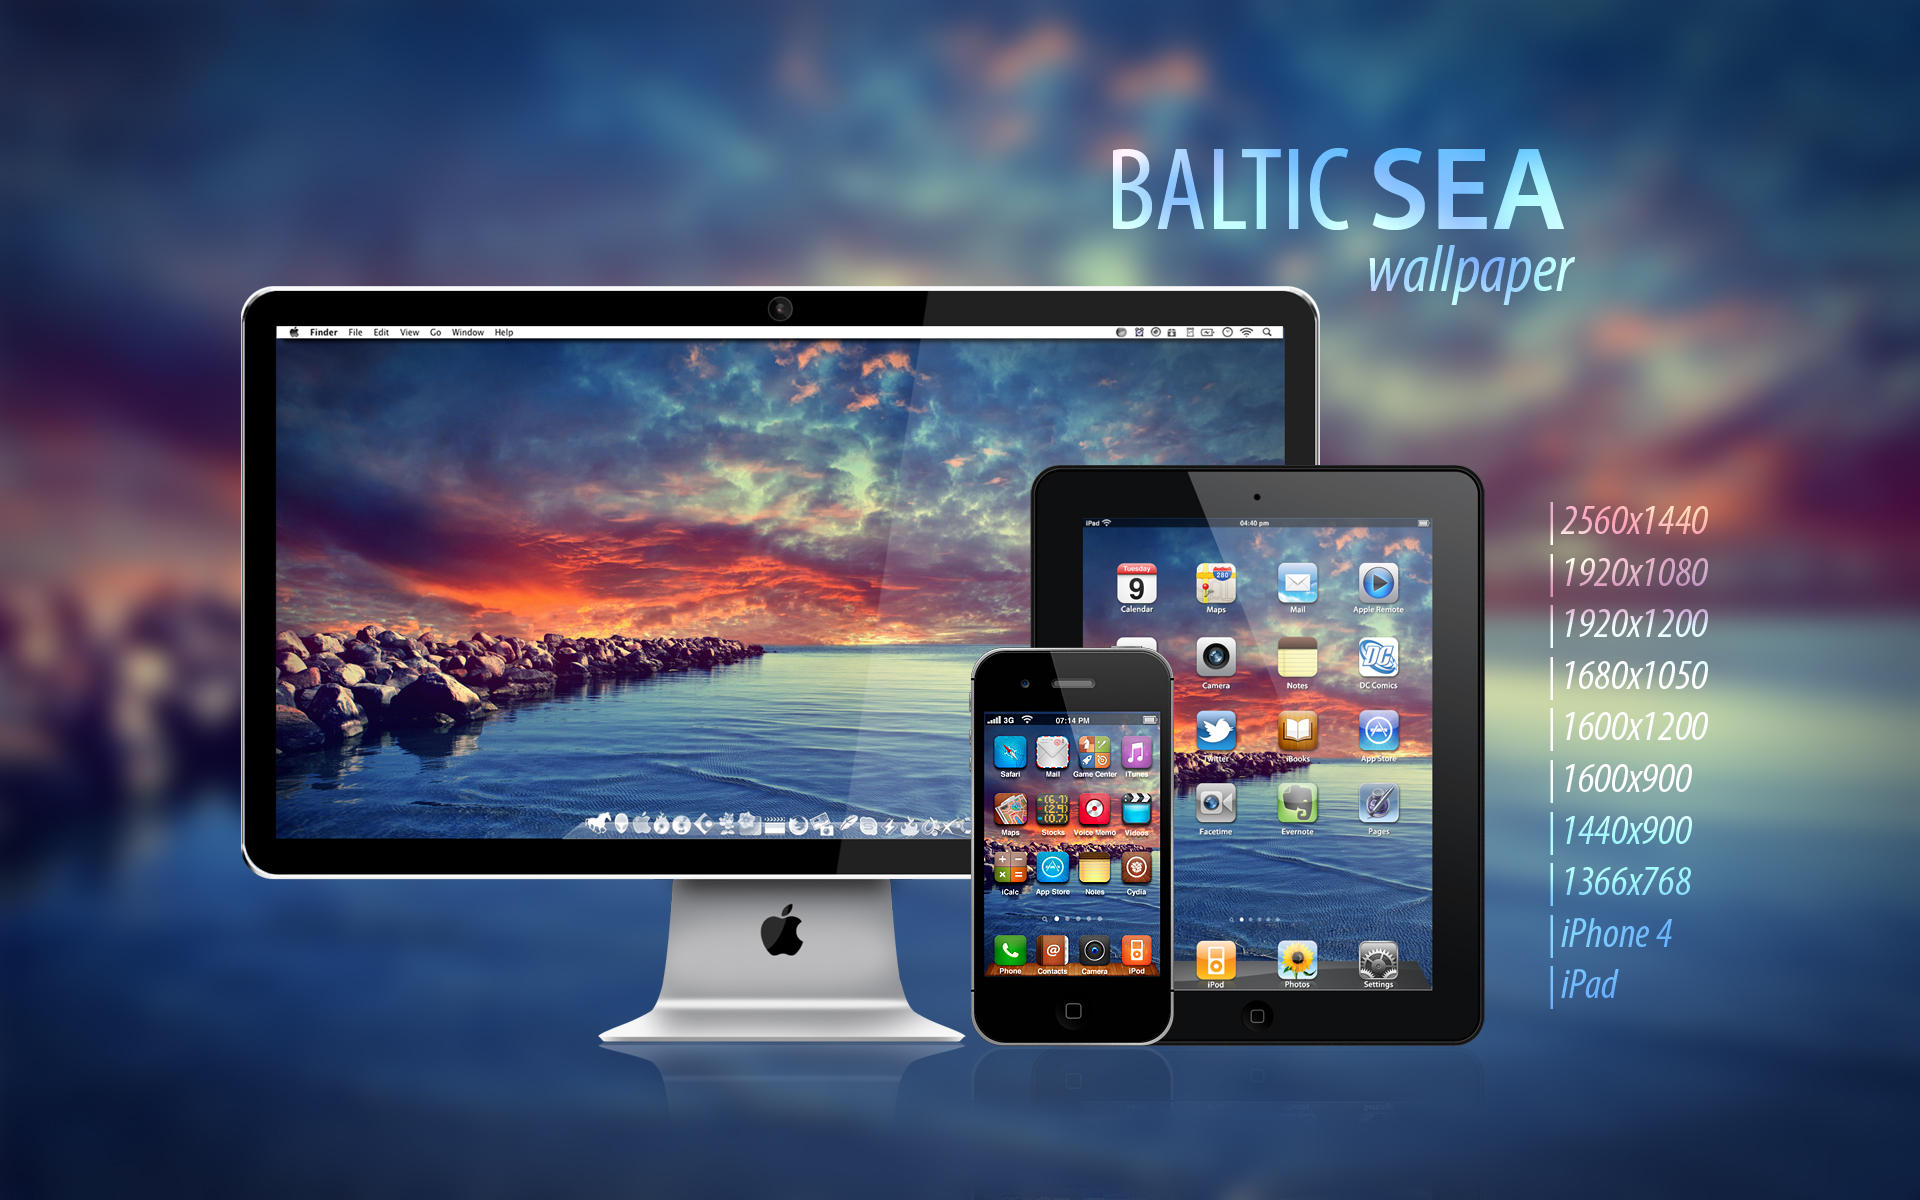 Baltic Sea HD desktop wallpaper Widescreen High Definition